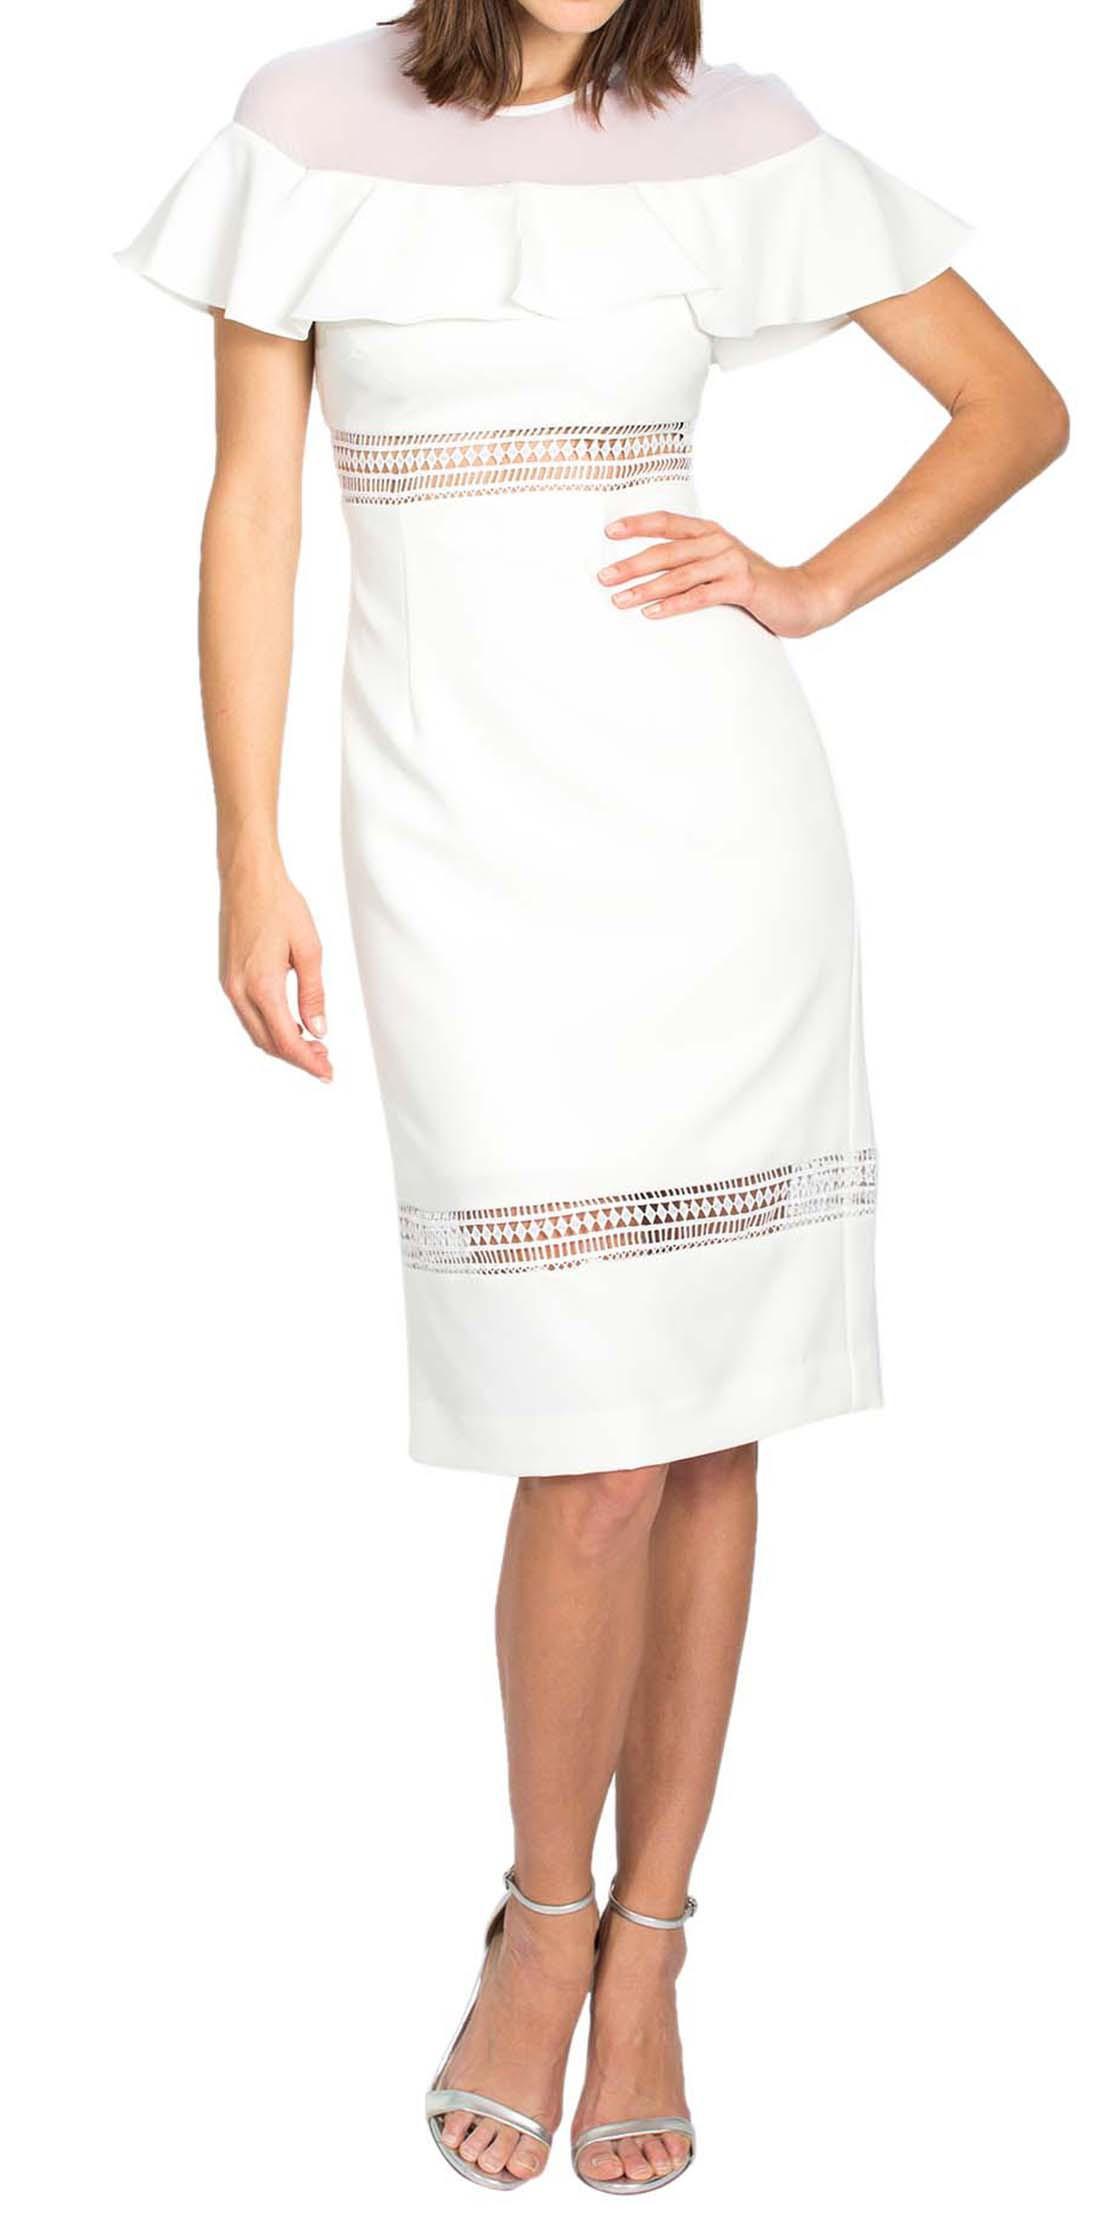 Cute Cocktail Dress Rentals Images - Wedding Dress Ideas - unijna.info